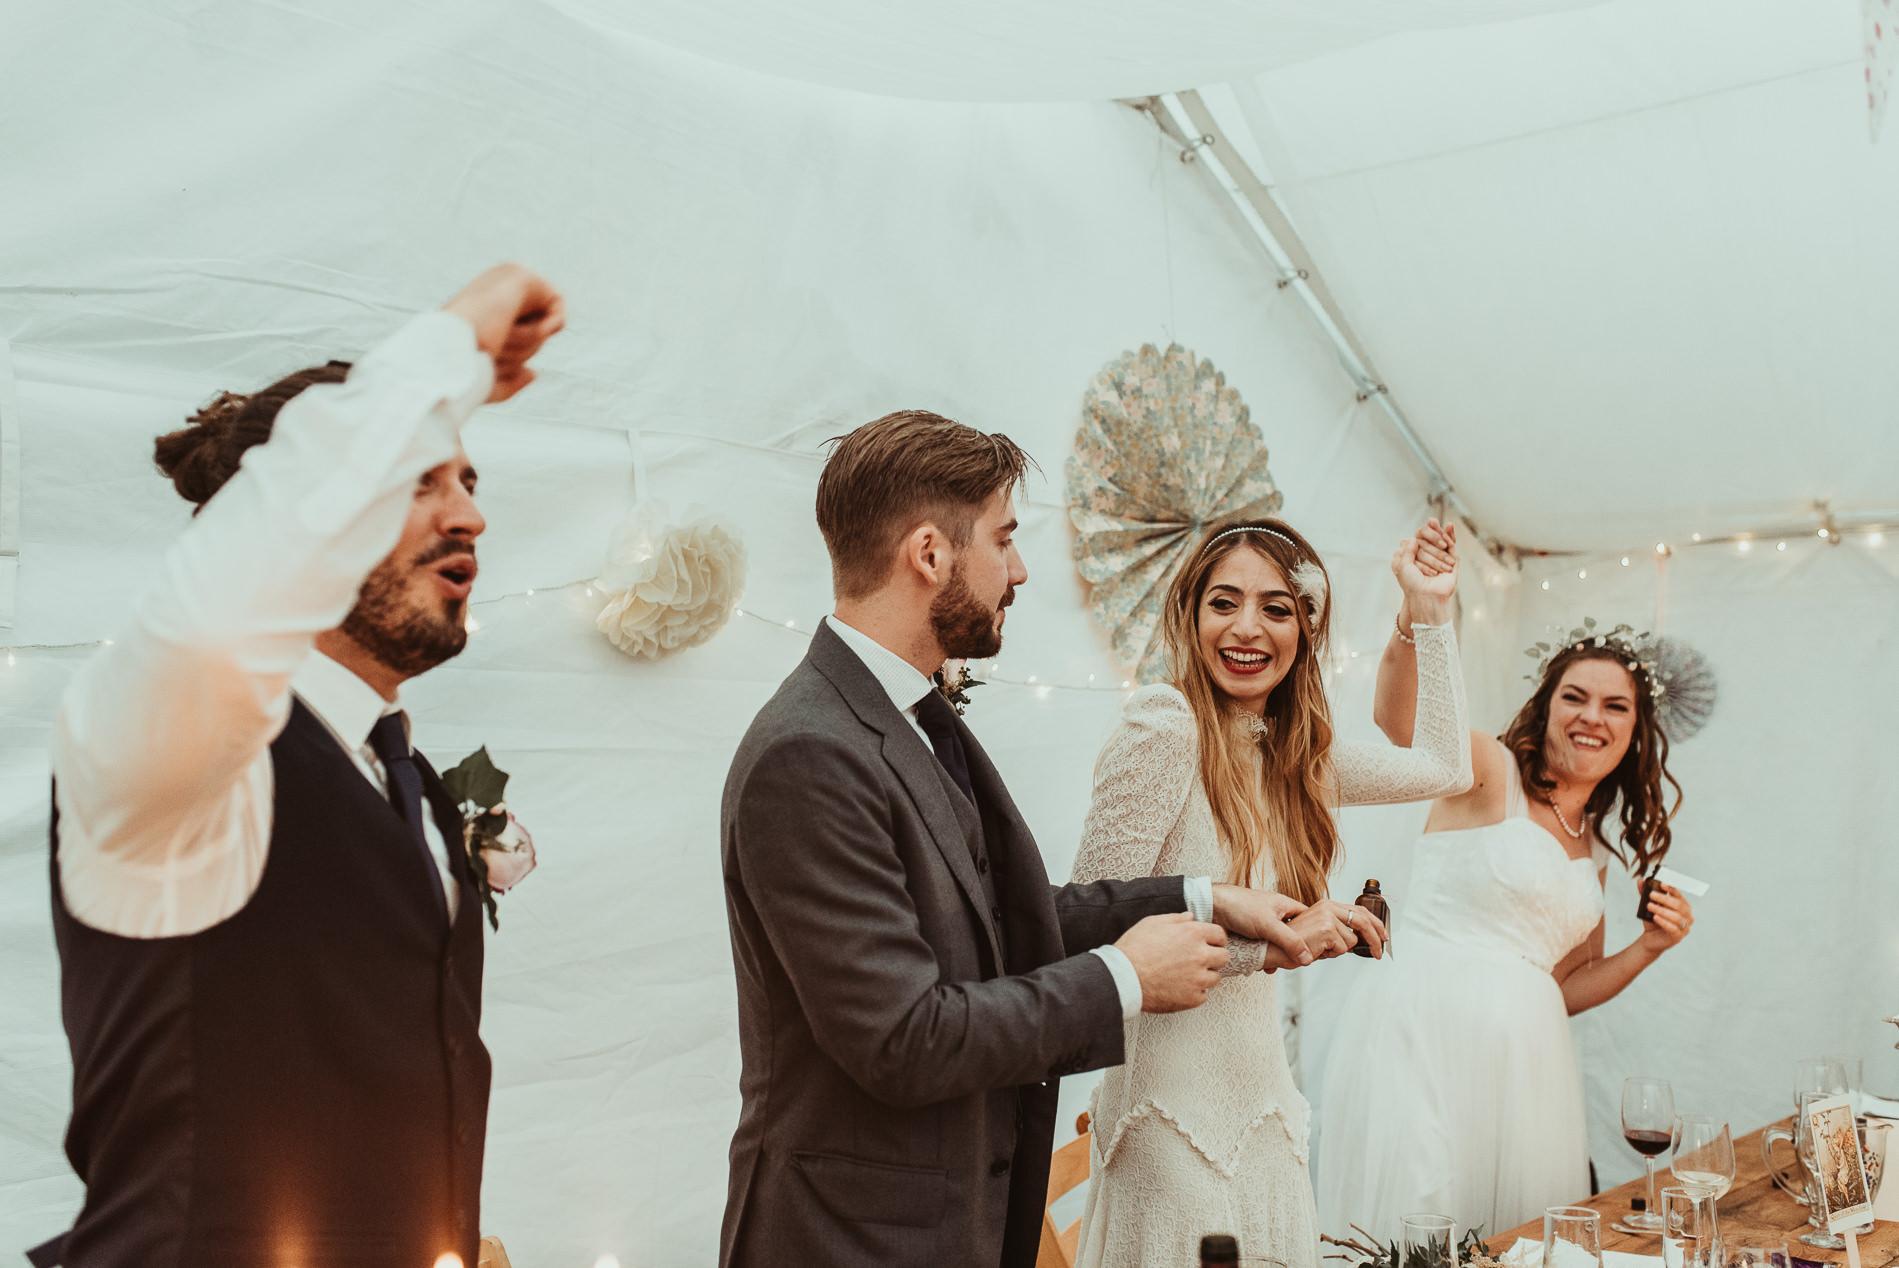 bohemian_wedding_lawshall_church_garden127